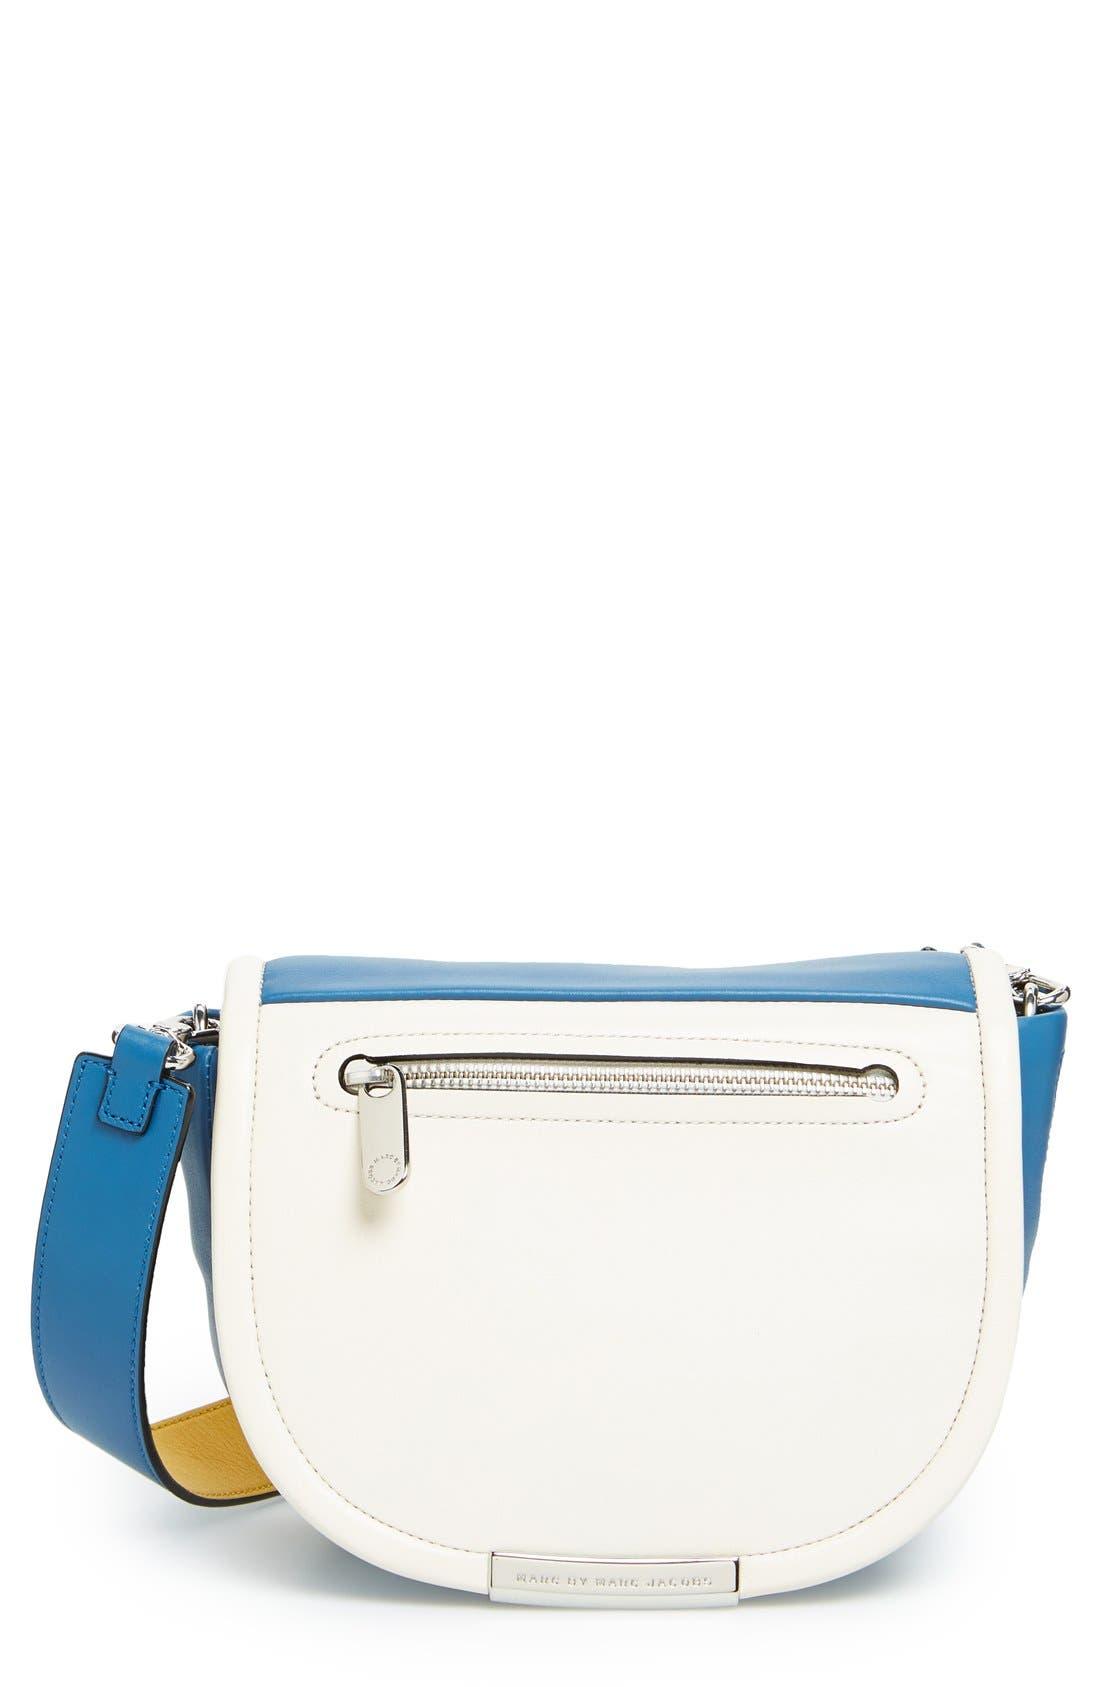 MARC BY MARC JACOBS 'Luna' Crossbody Bag,                             Main thumbnail 1, color,                             Bluestone Multi